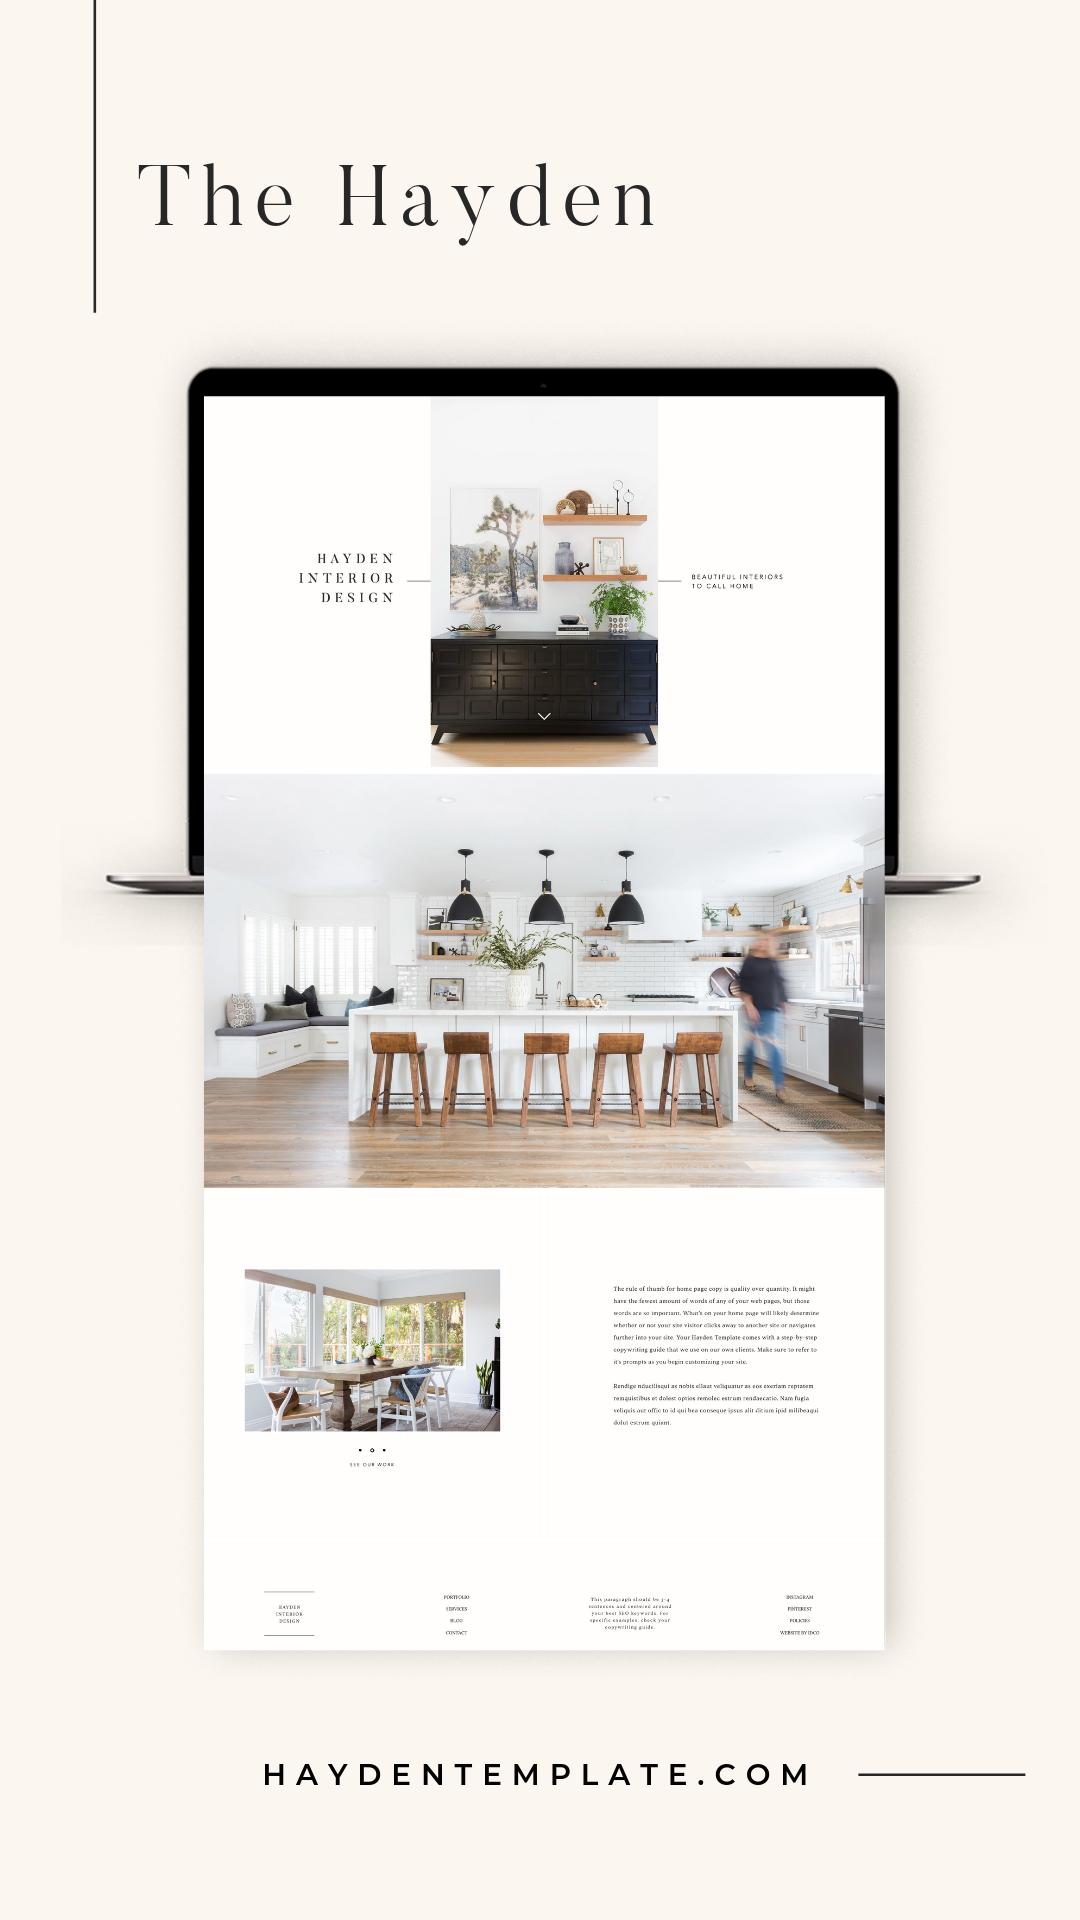 Meet The Hayden Beautiful Minimal Web Design Template For